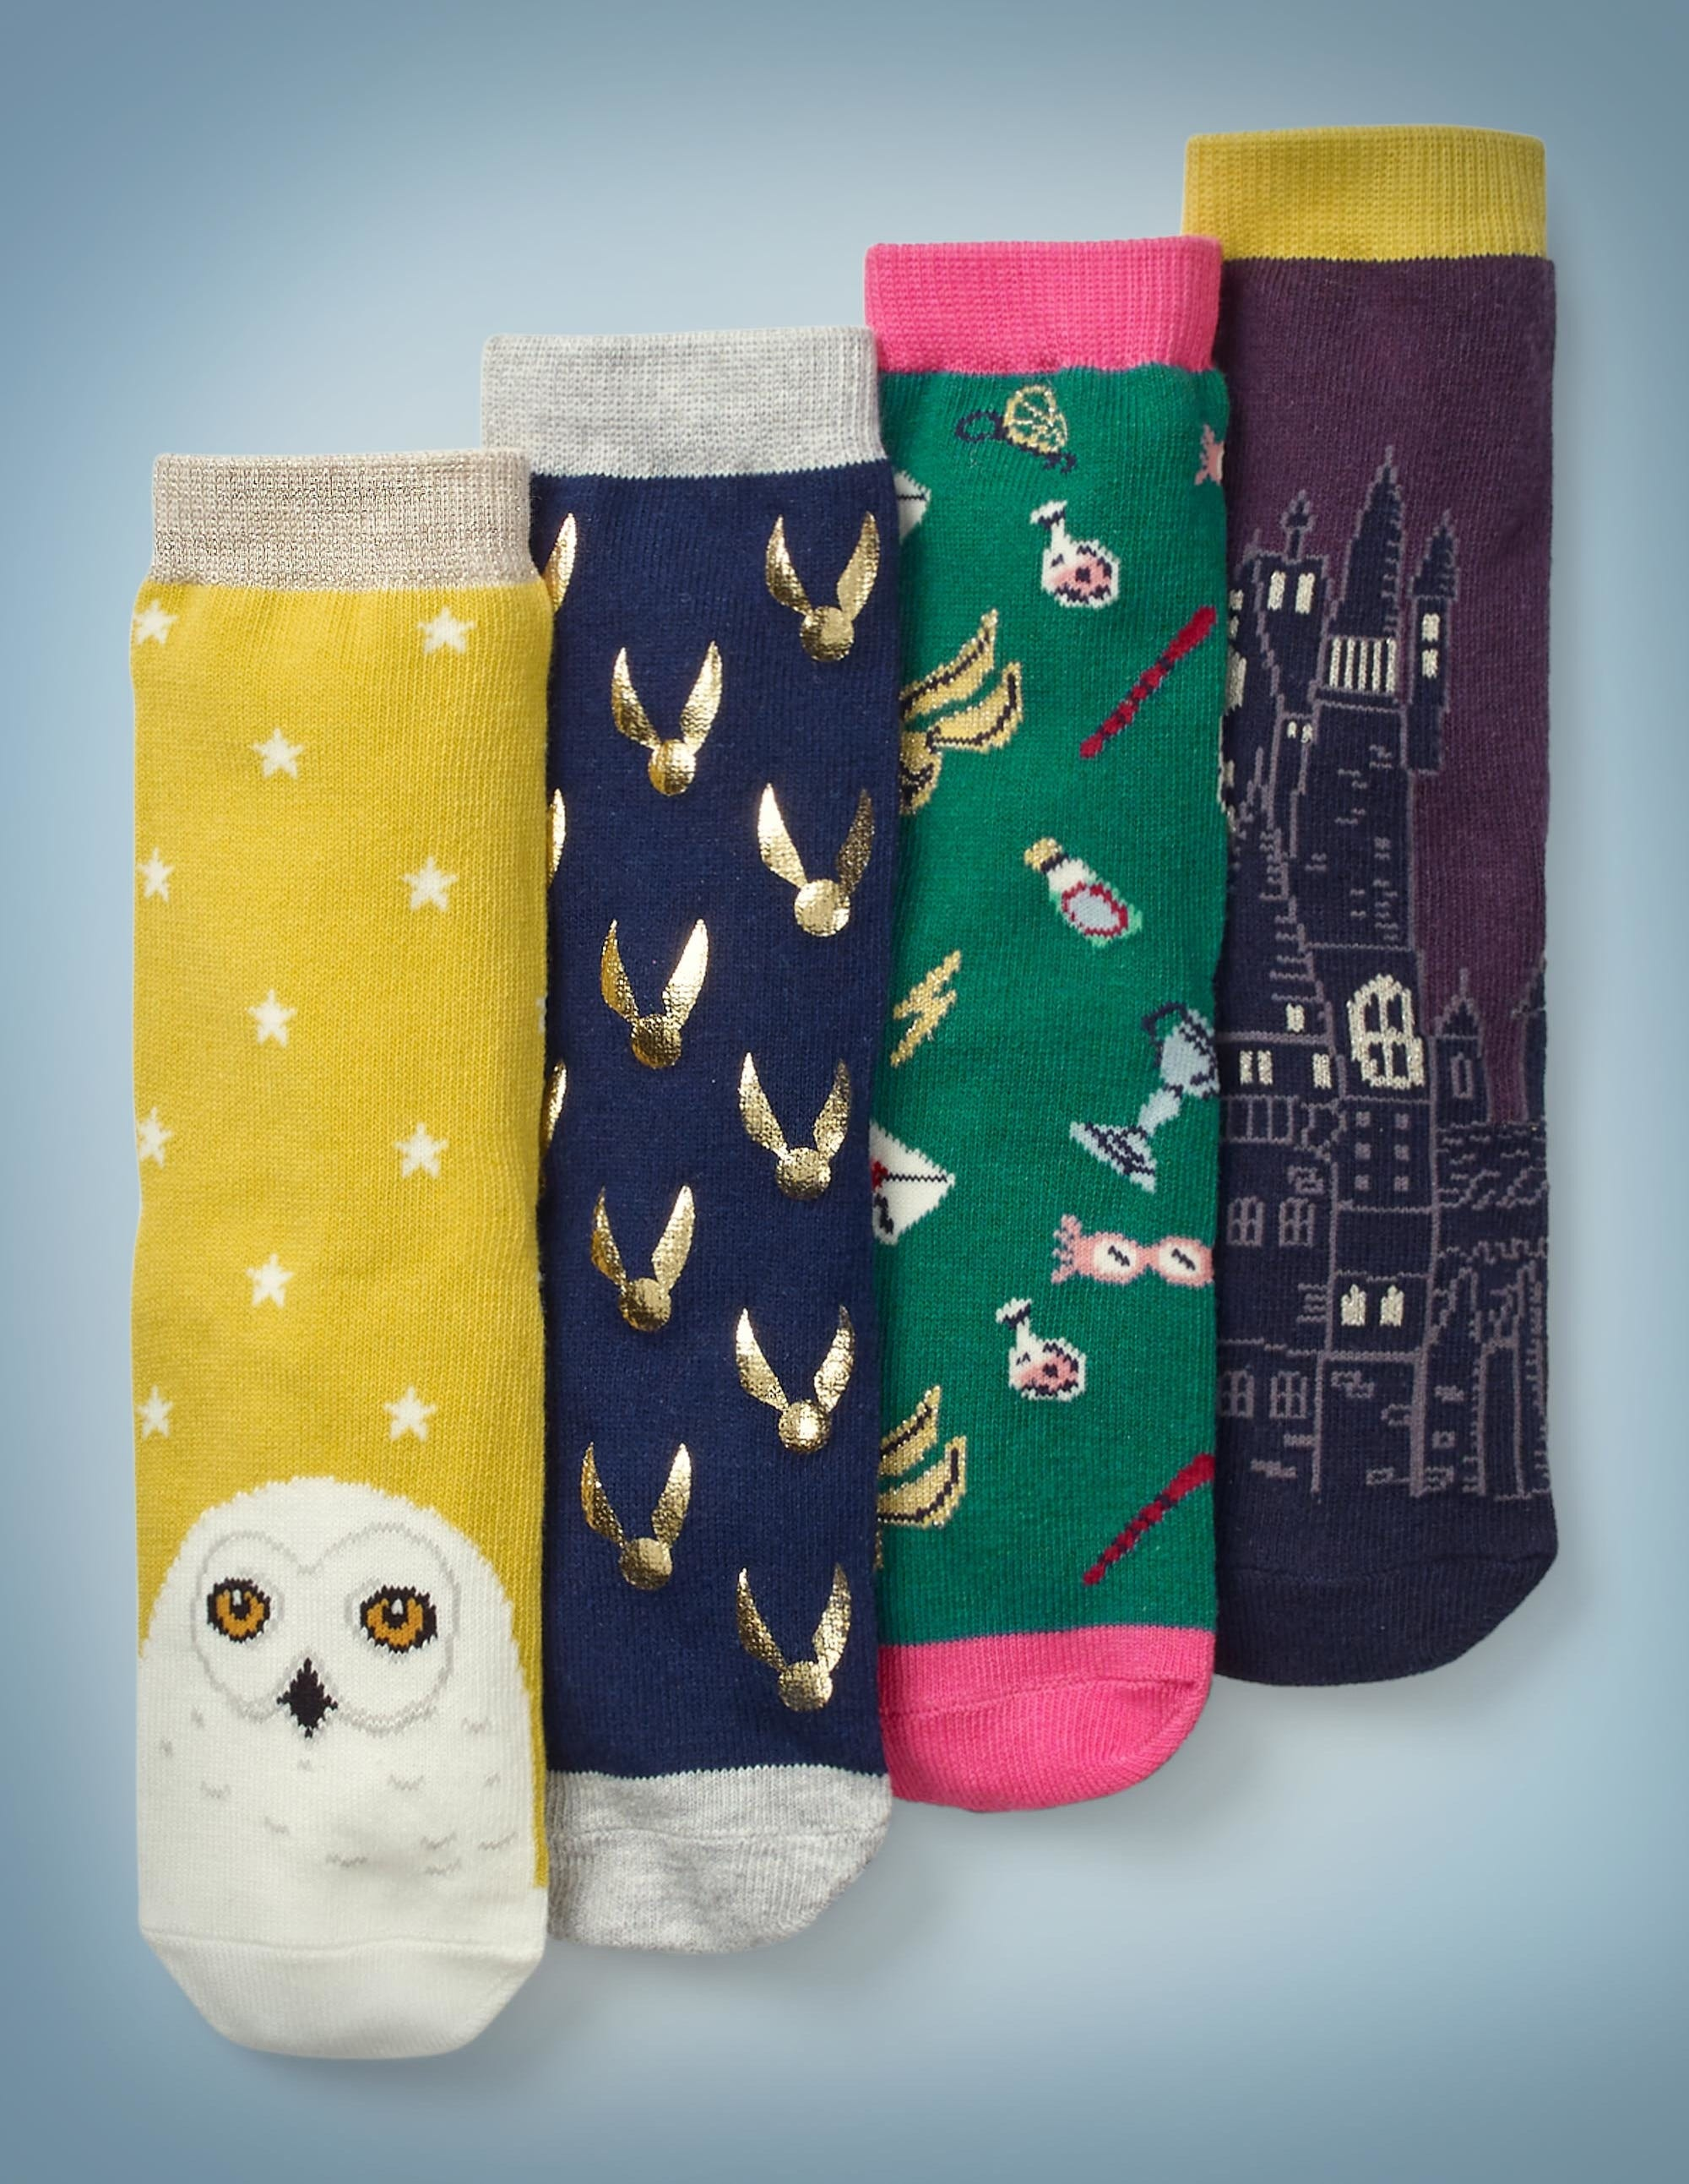 5 Pair Cute Newborn Baby Girls Boys Soft Socks Mixed Color New Design Best  HK